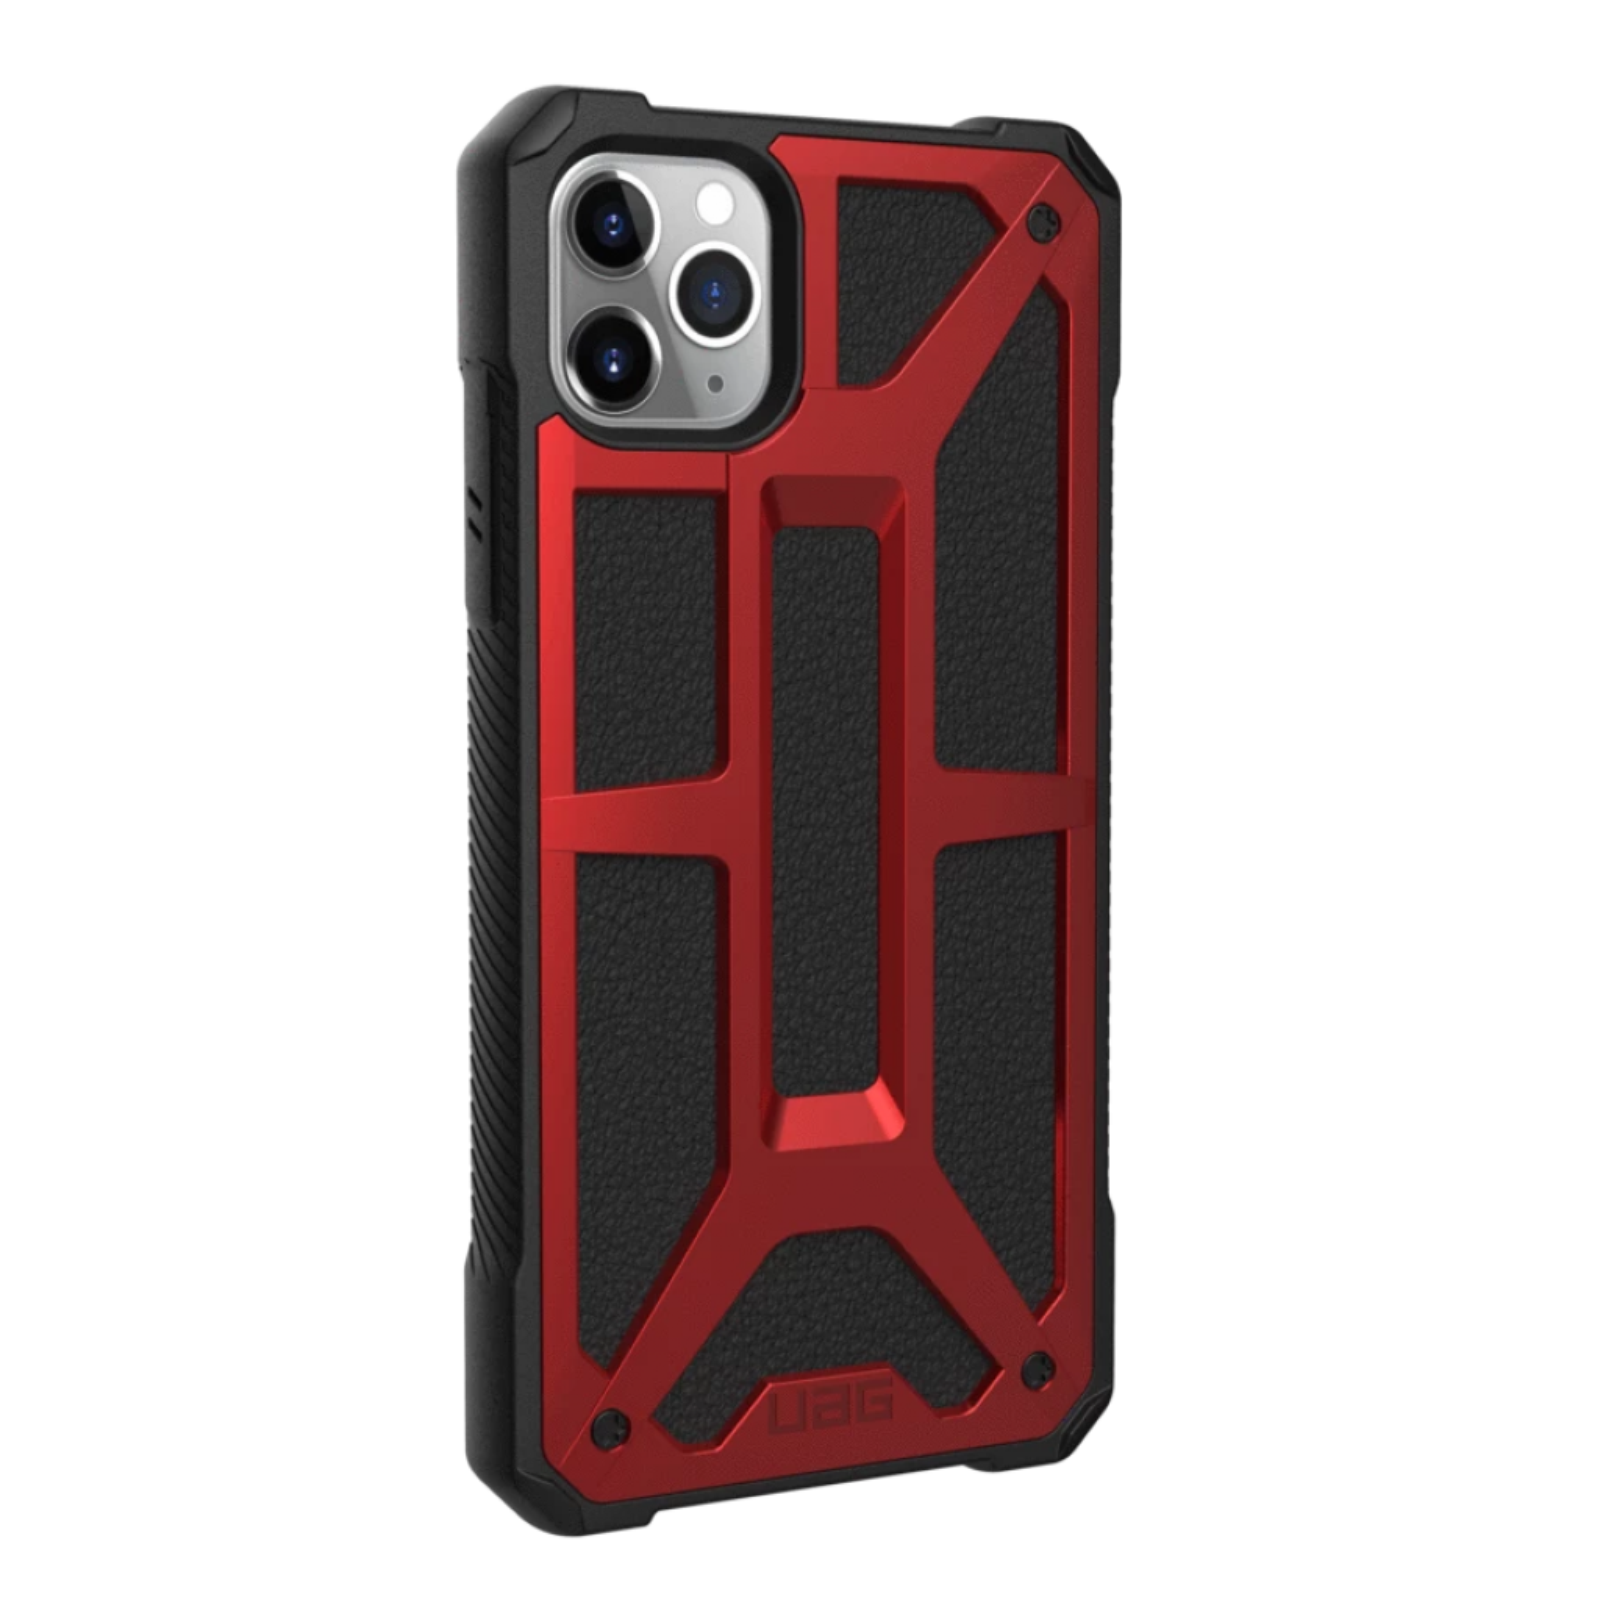 Чехол для моб. телефона Uag iPhone 11 Pro Max Monarch, Black (111721114040) изображение 2